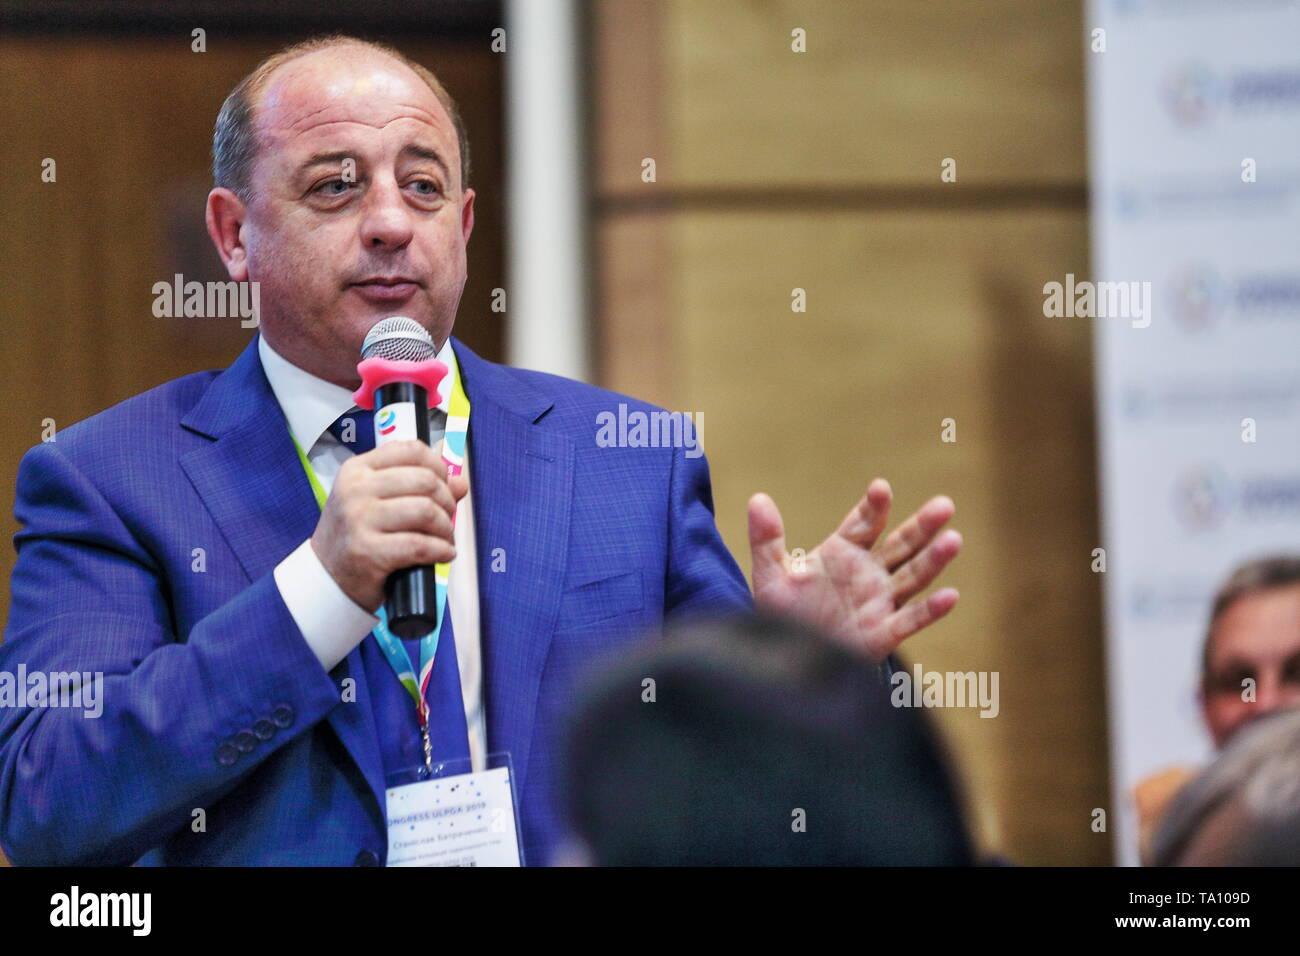 Ukraine's LPG Association (ULPGA) President Stanislav Batrachenko speaks at annual ULPGA Congress-19. Forum raised issues of LPG market development. - Stock Image